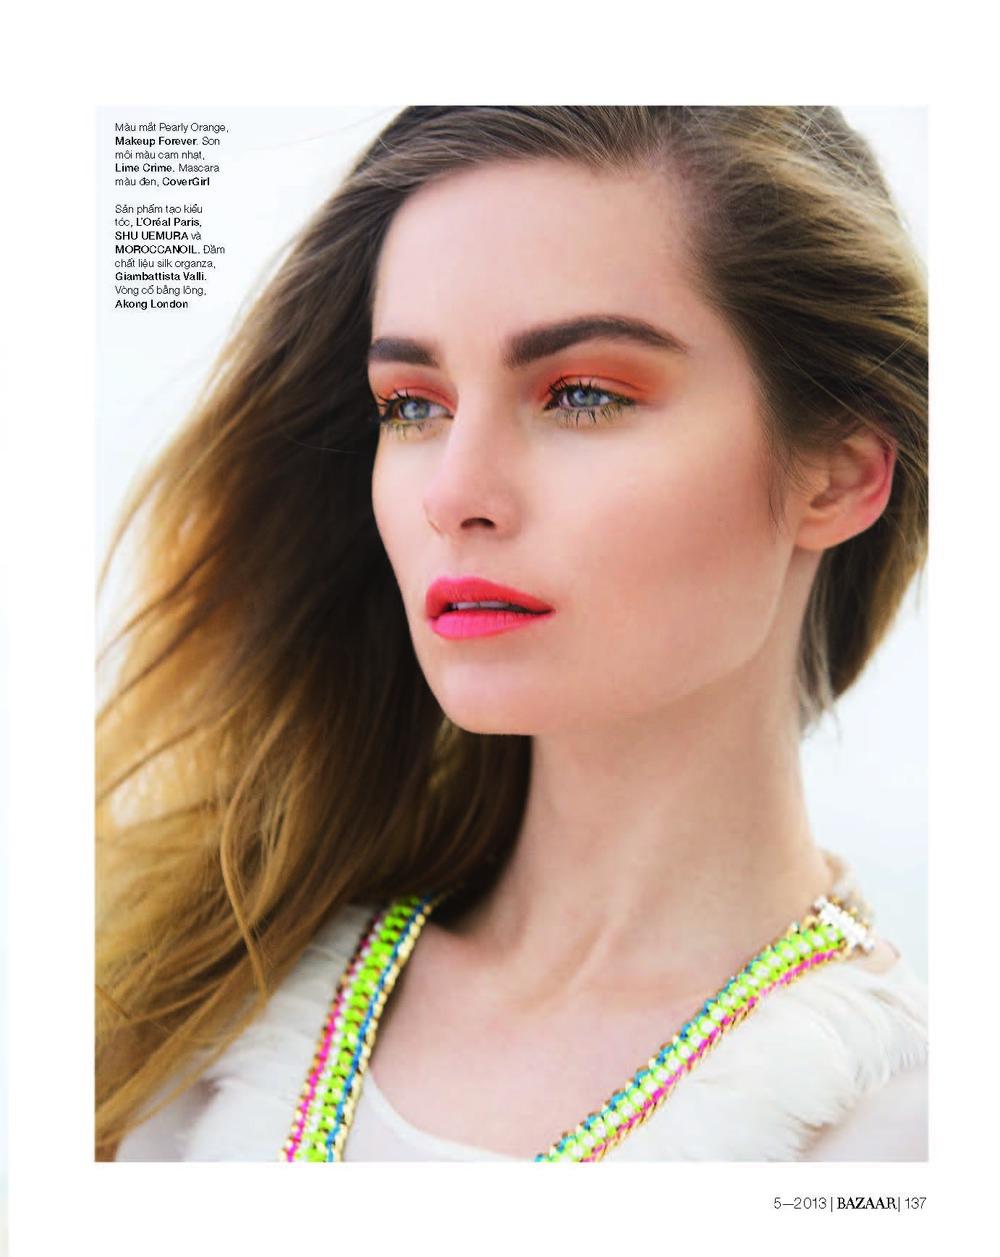 2013-05 Harpers Bazaar VT - Inside.jpg